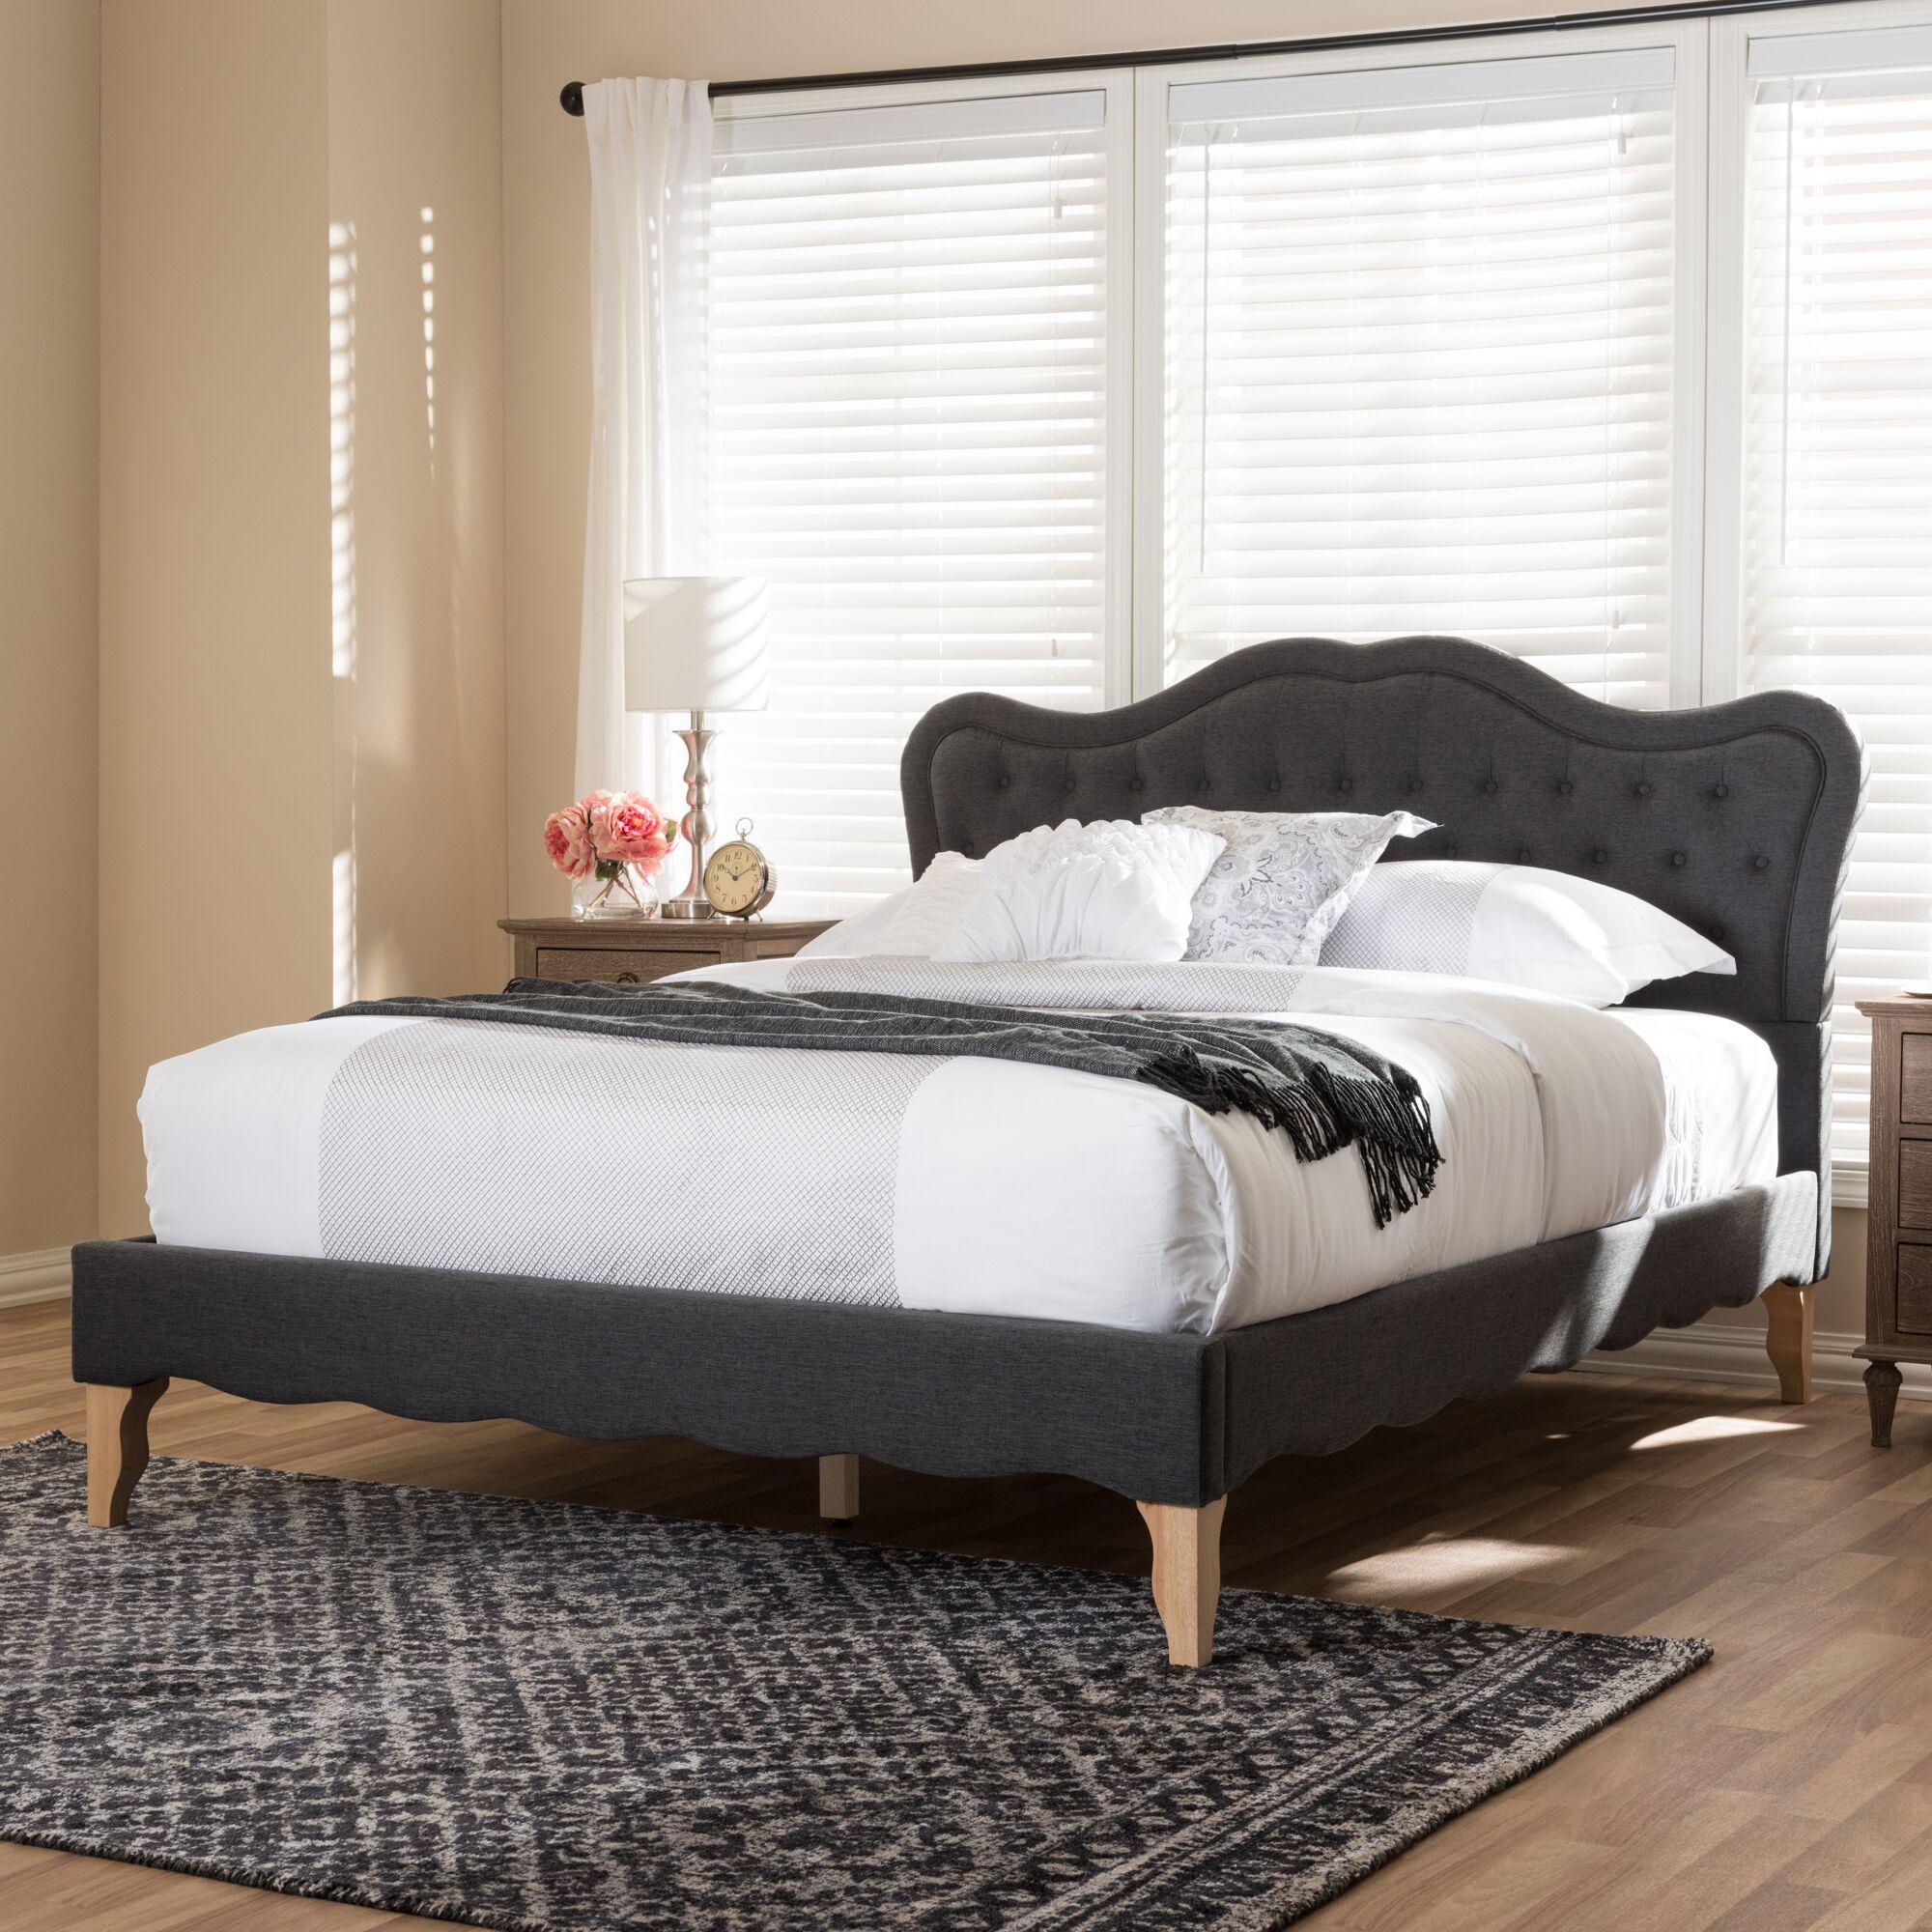 Adalheida Upholstered Platform Bed Color: Dark Gray, Size: Full/Double